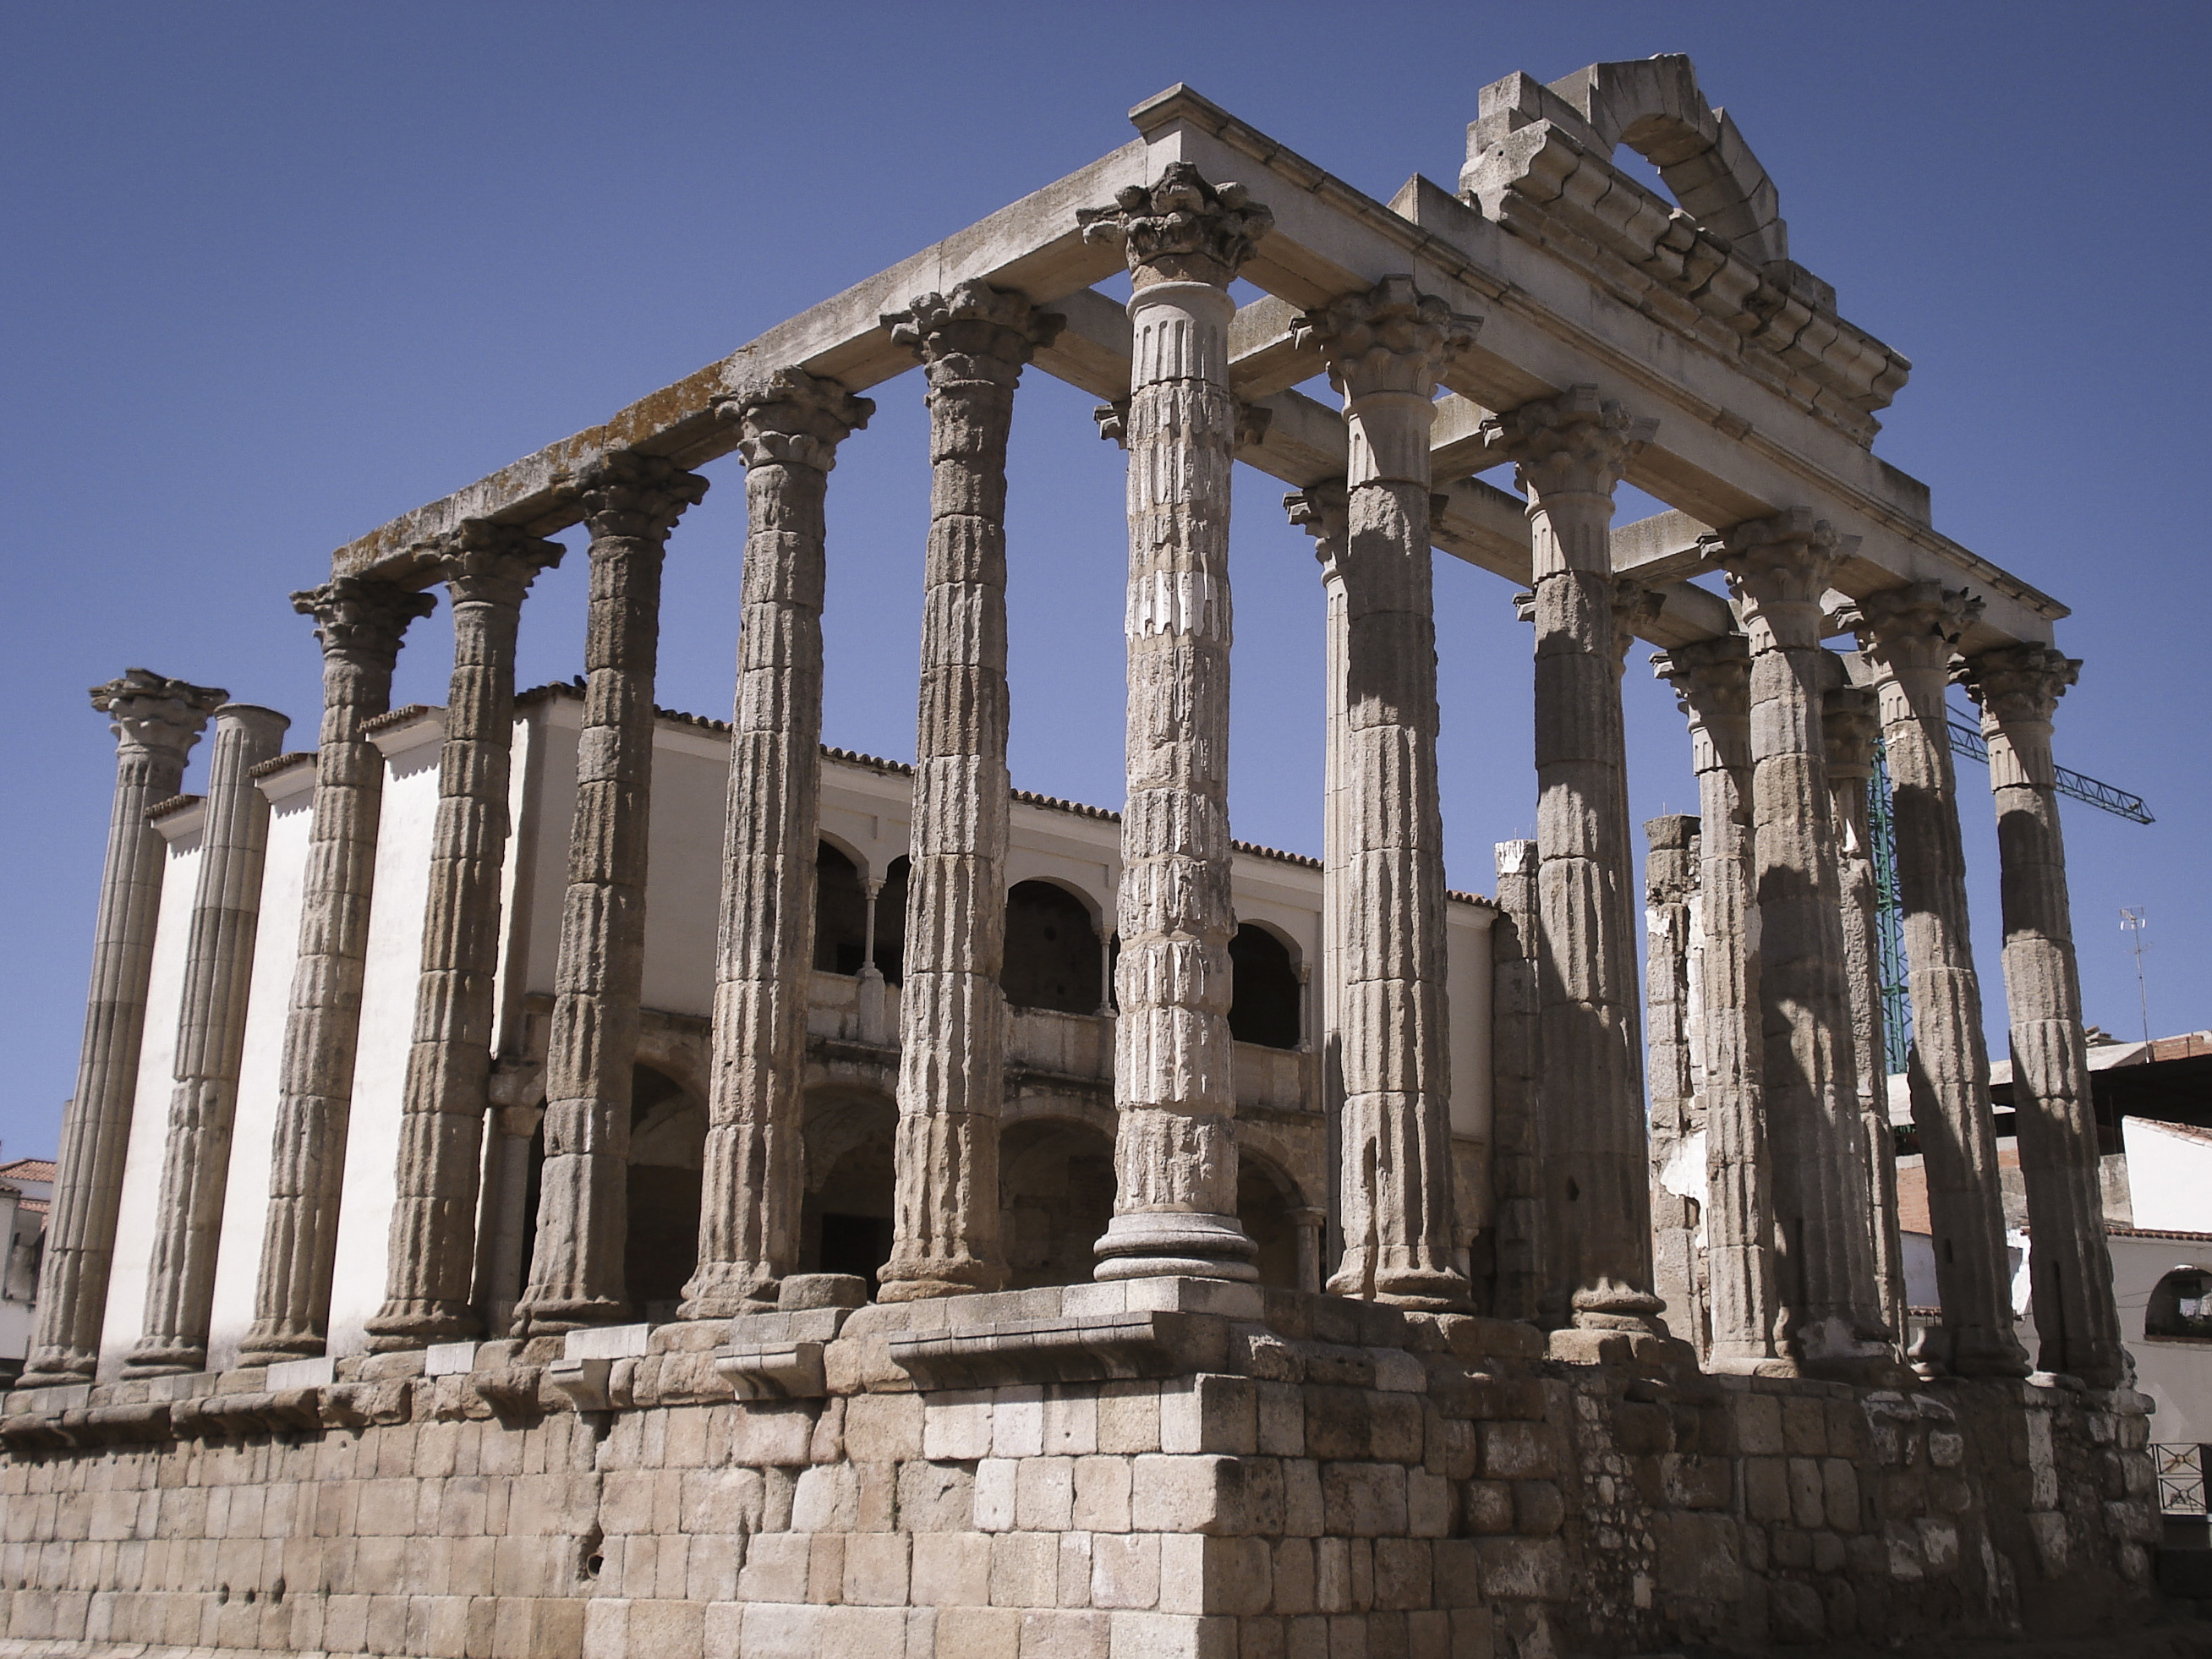 FileTemplo de Diana foro Mridajpg  Wikimedia Commons